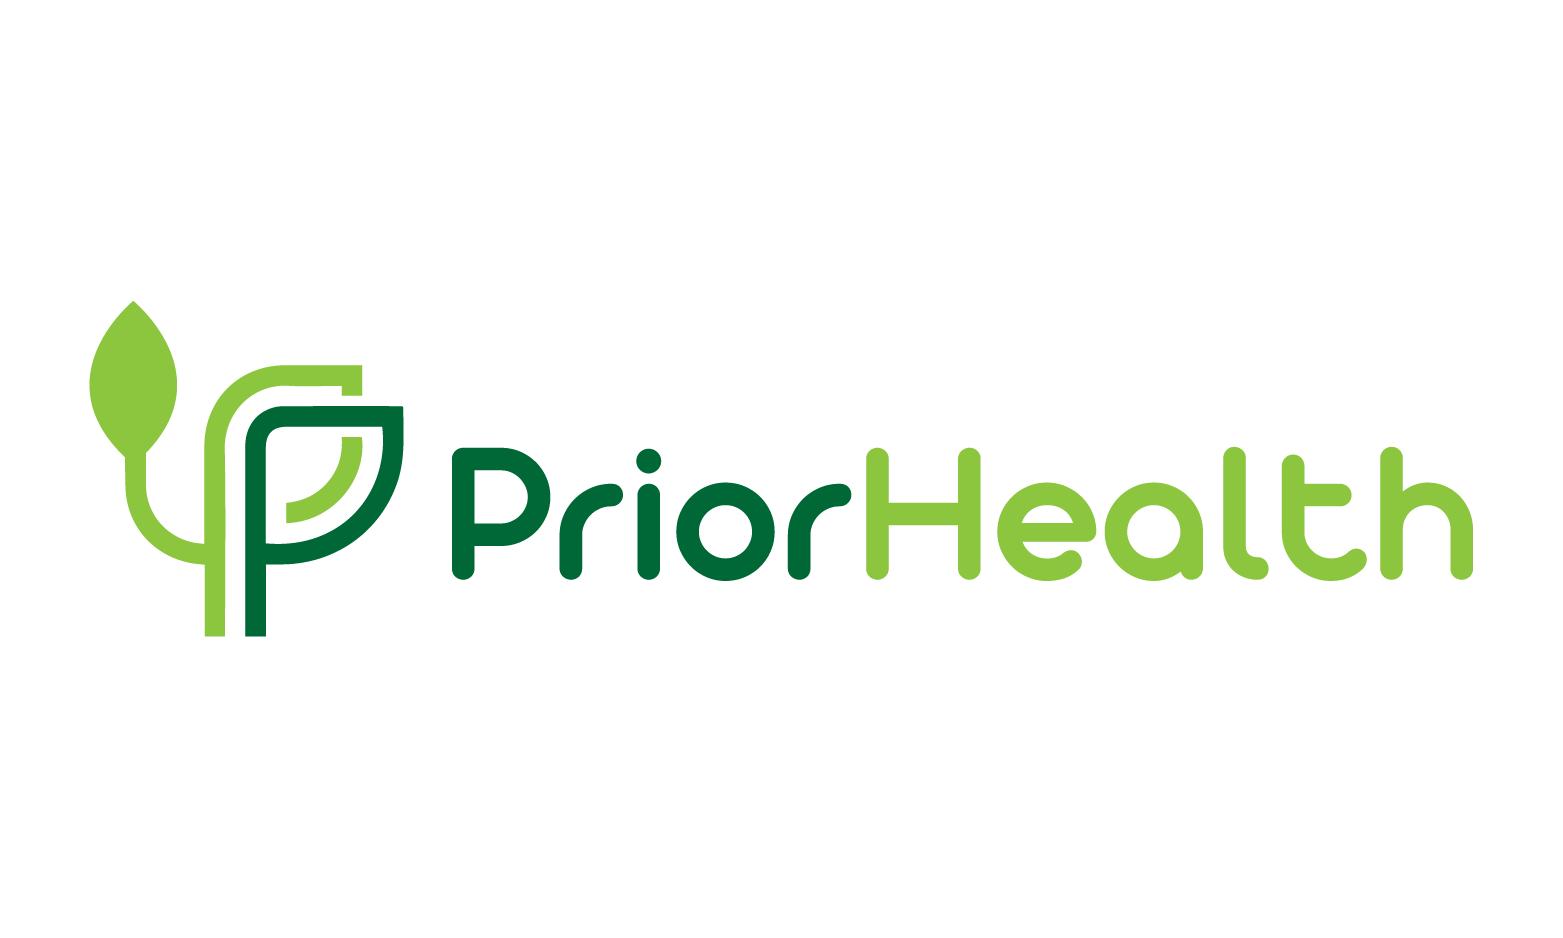 PriorHealth.com